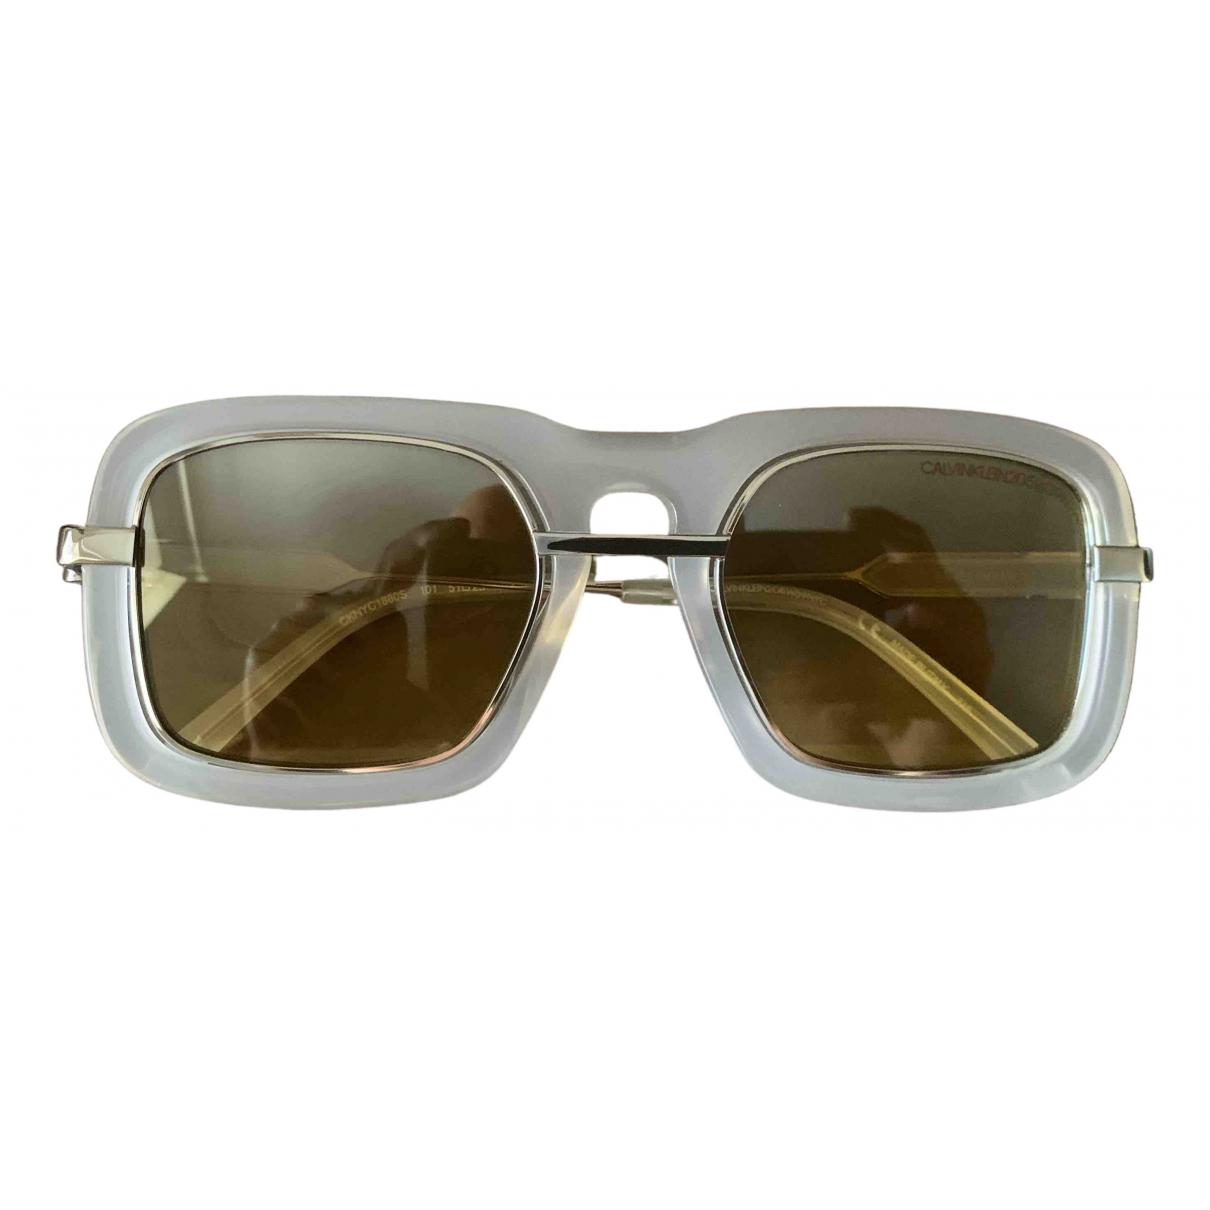 Calvin Klein 205w39nyc - Lunettes   pour homme - blanc